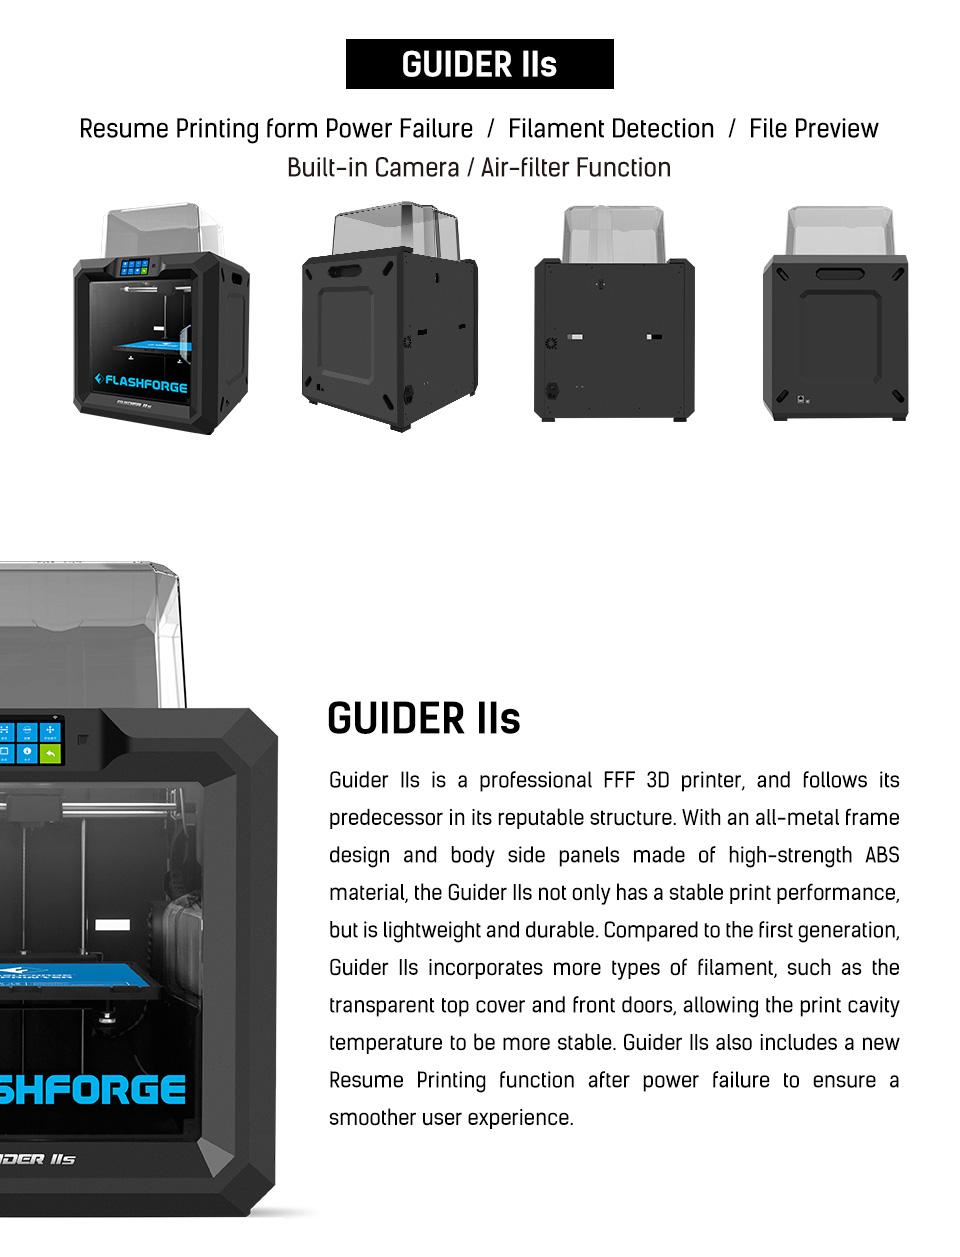 Guider IIS